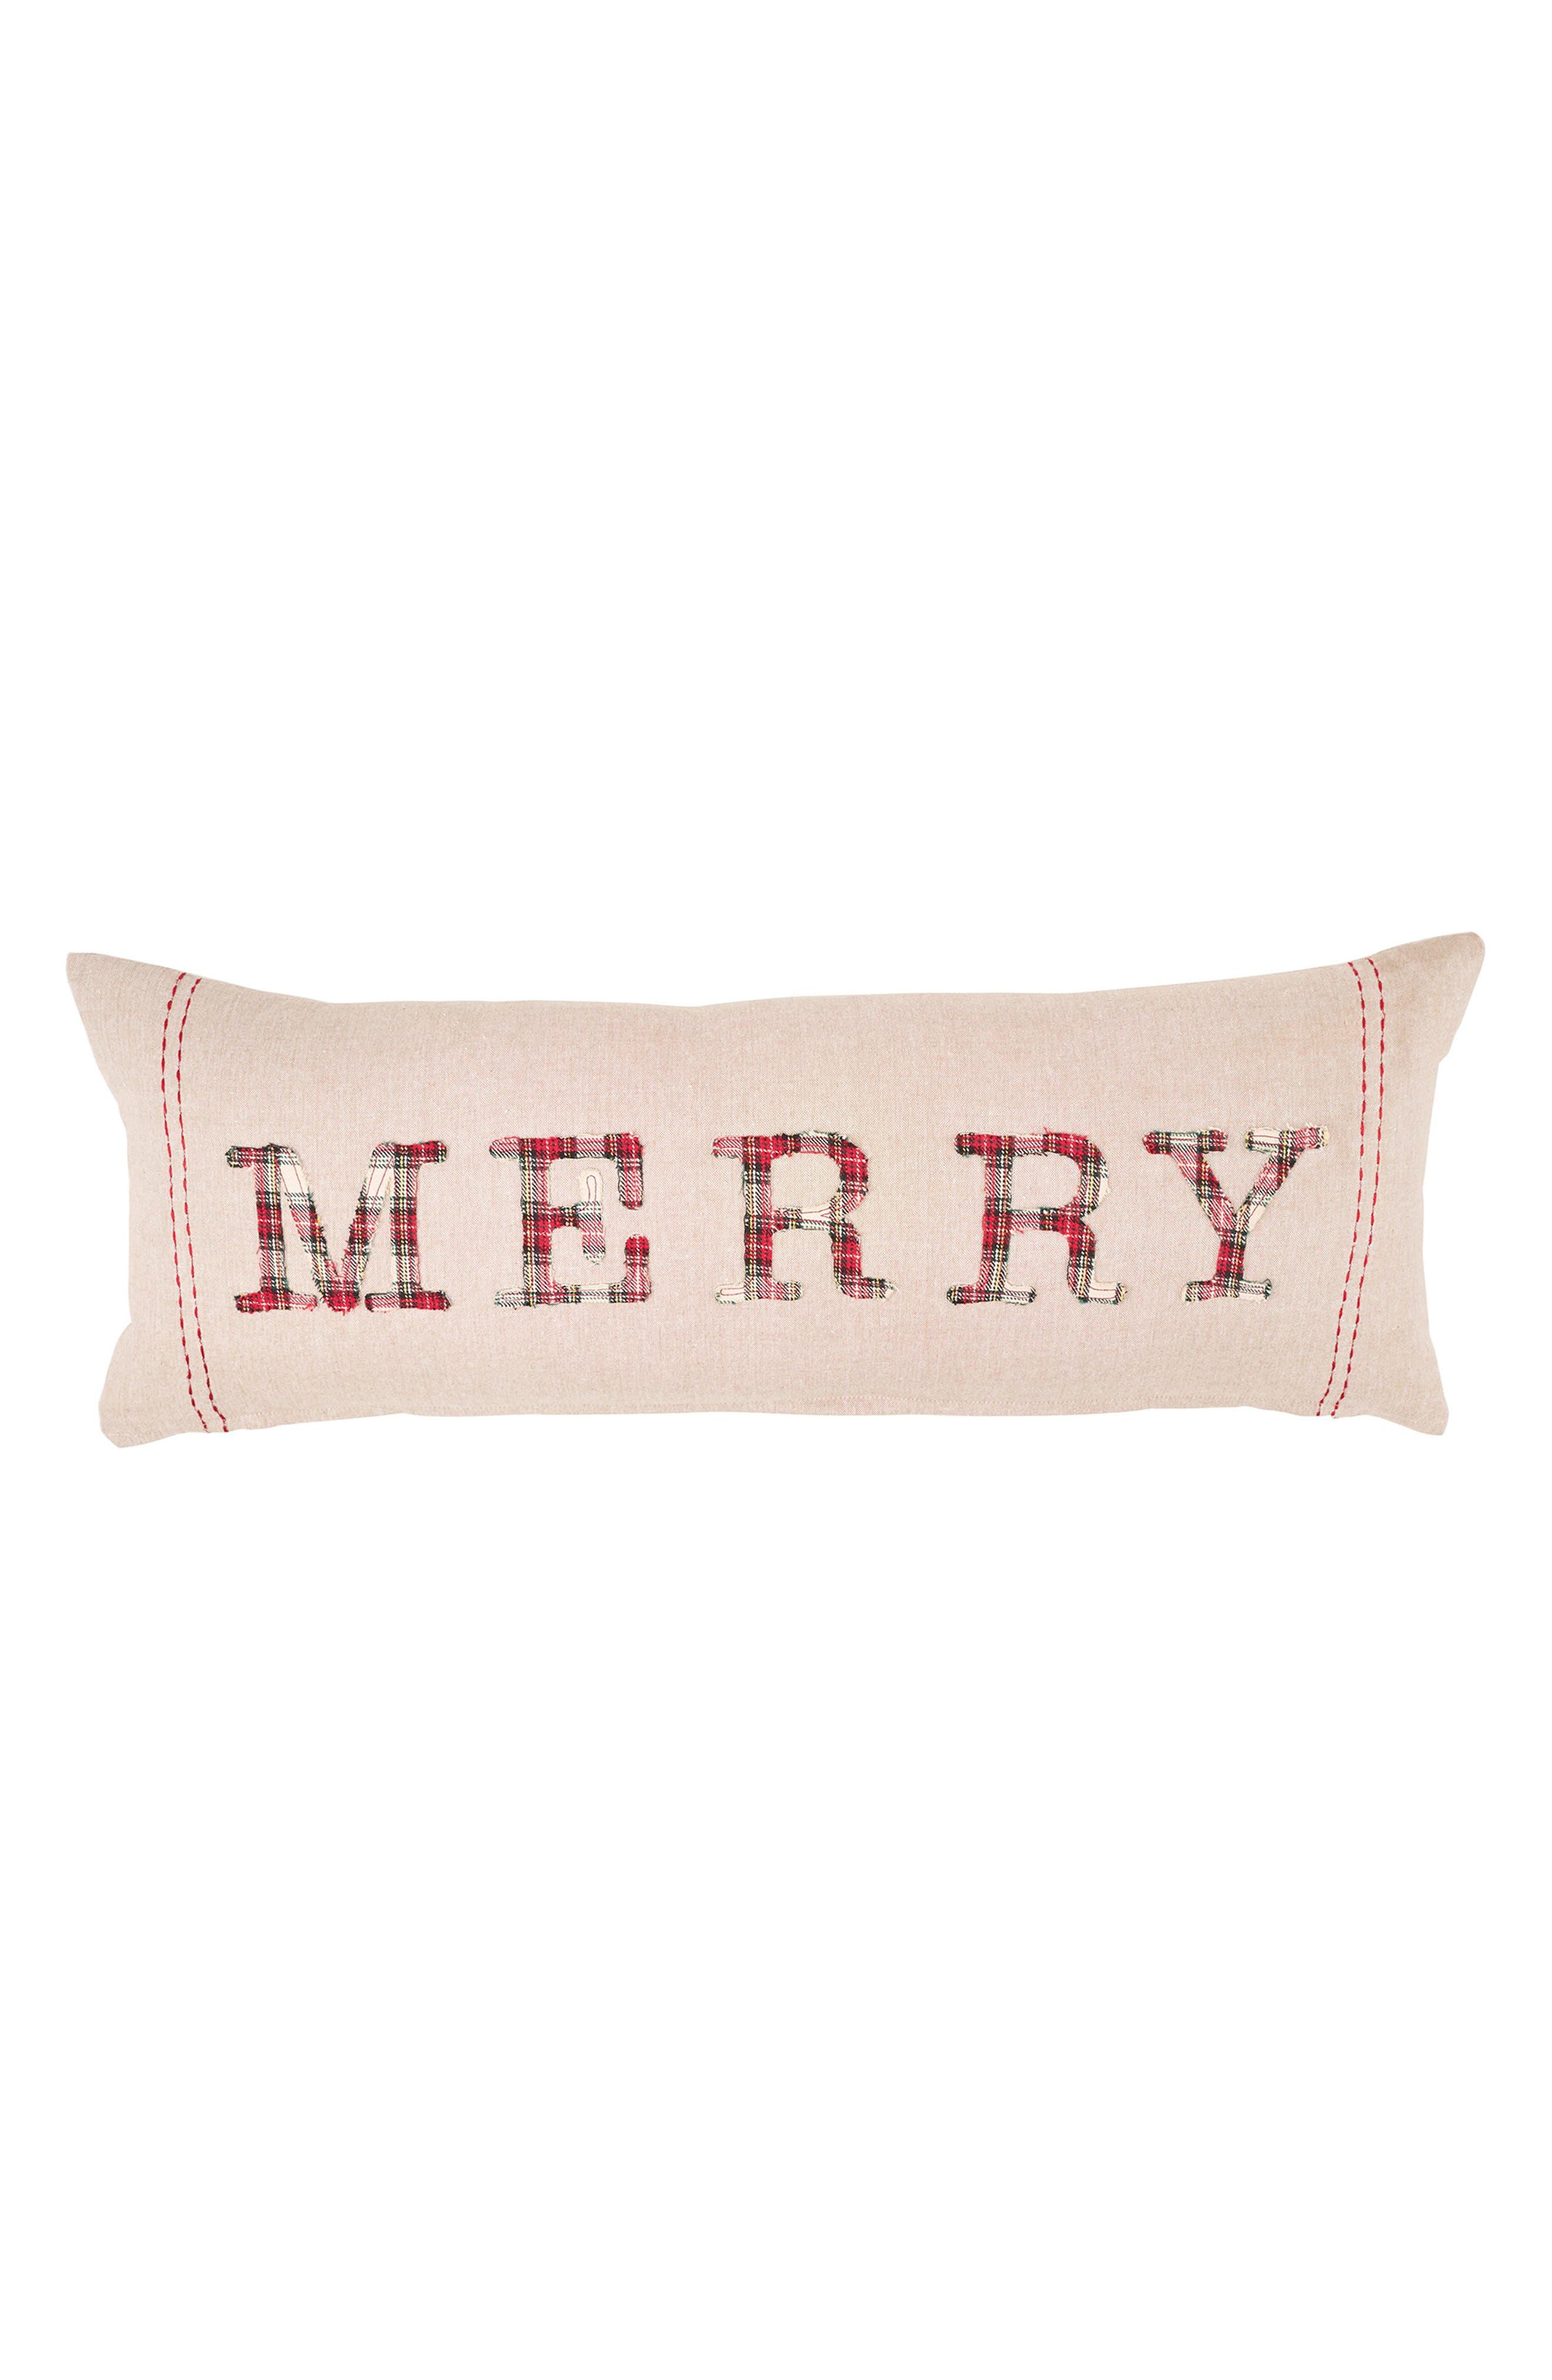 Merry Tartan Appliqué Accent Pillow,                             Main thumbnail 1, color,                             250